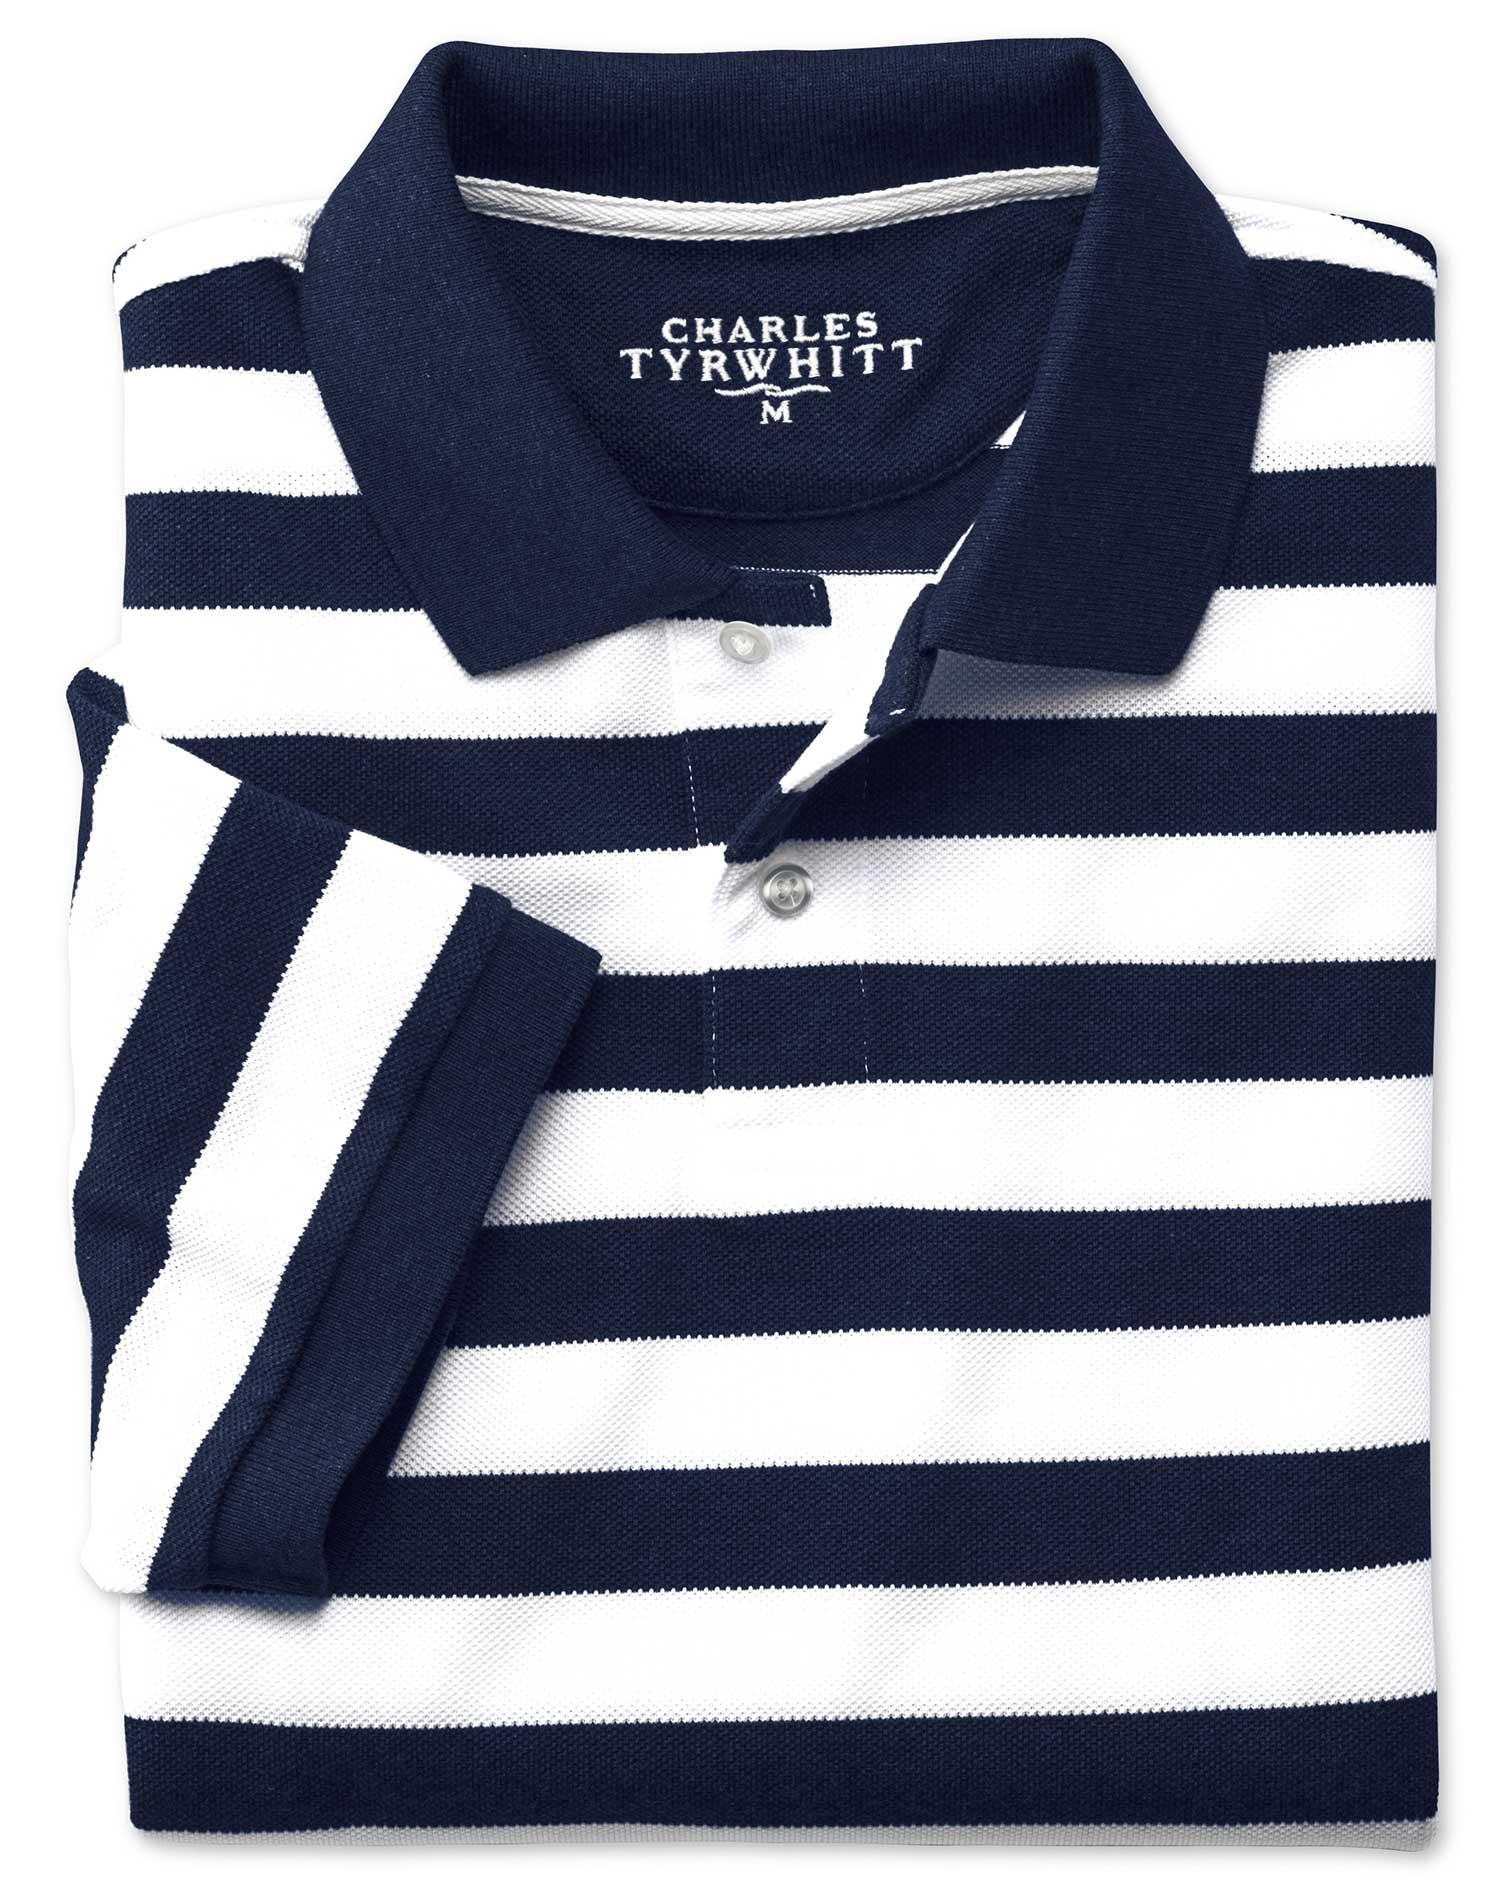 Navy and White Stripe Pique Cotton Polo Size Medium by Charles Tyrwhitt